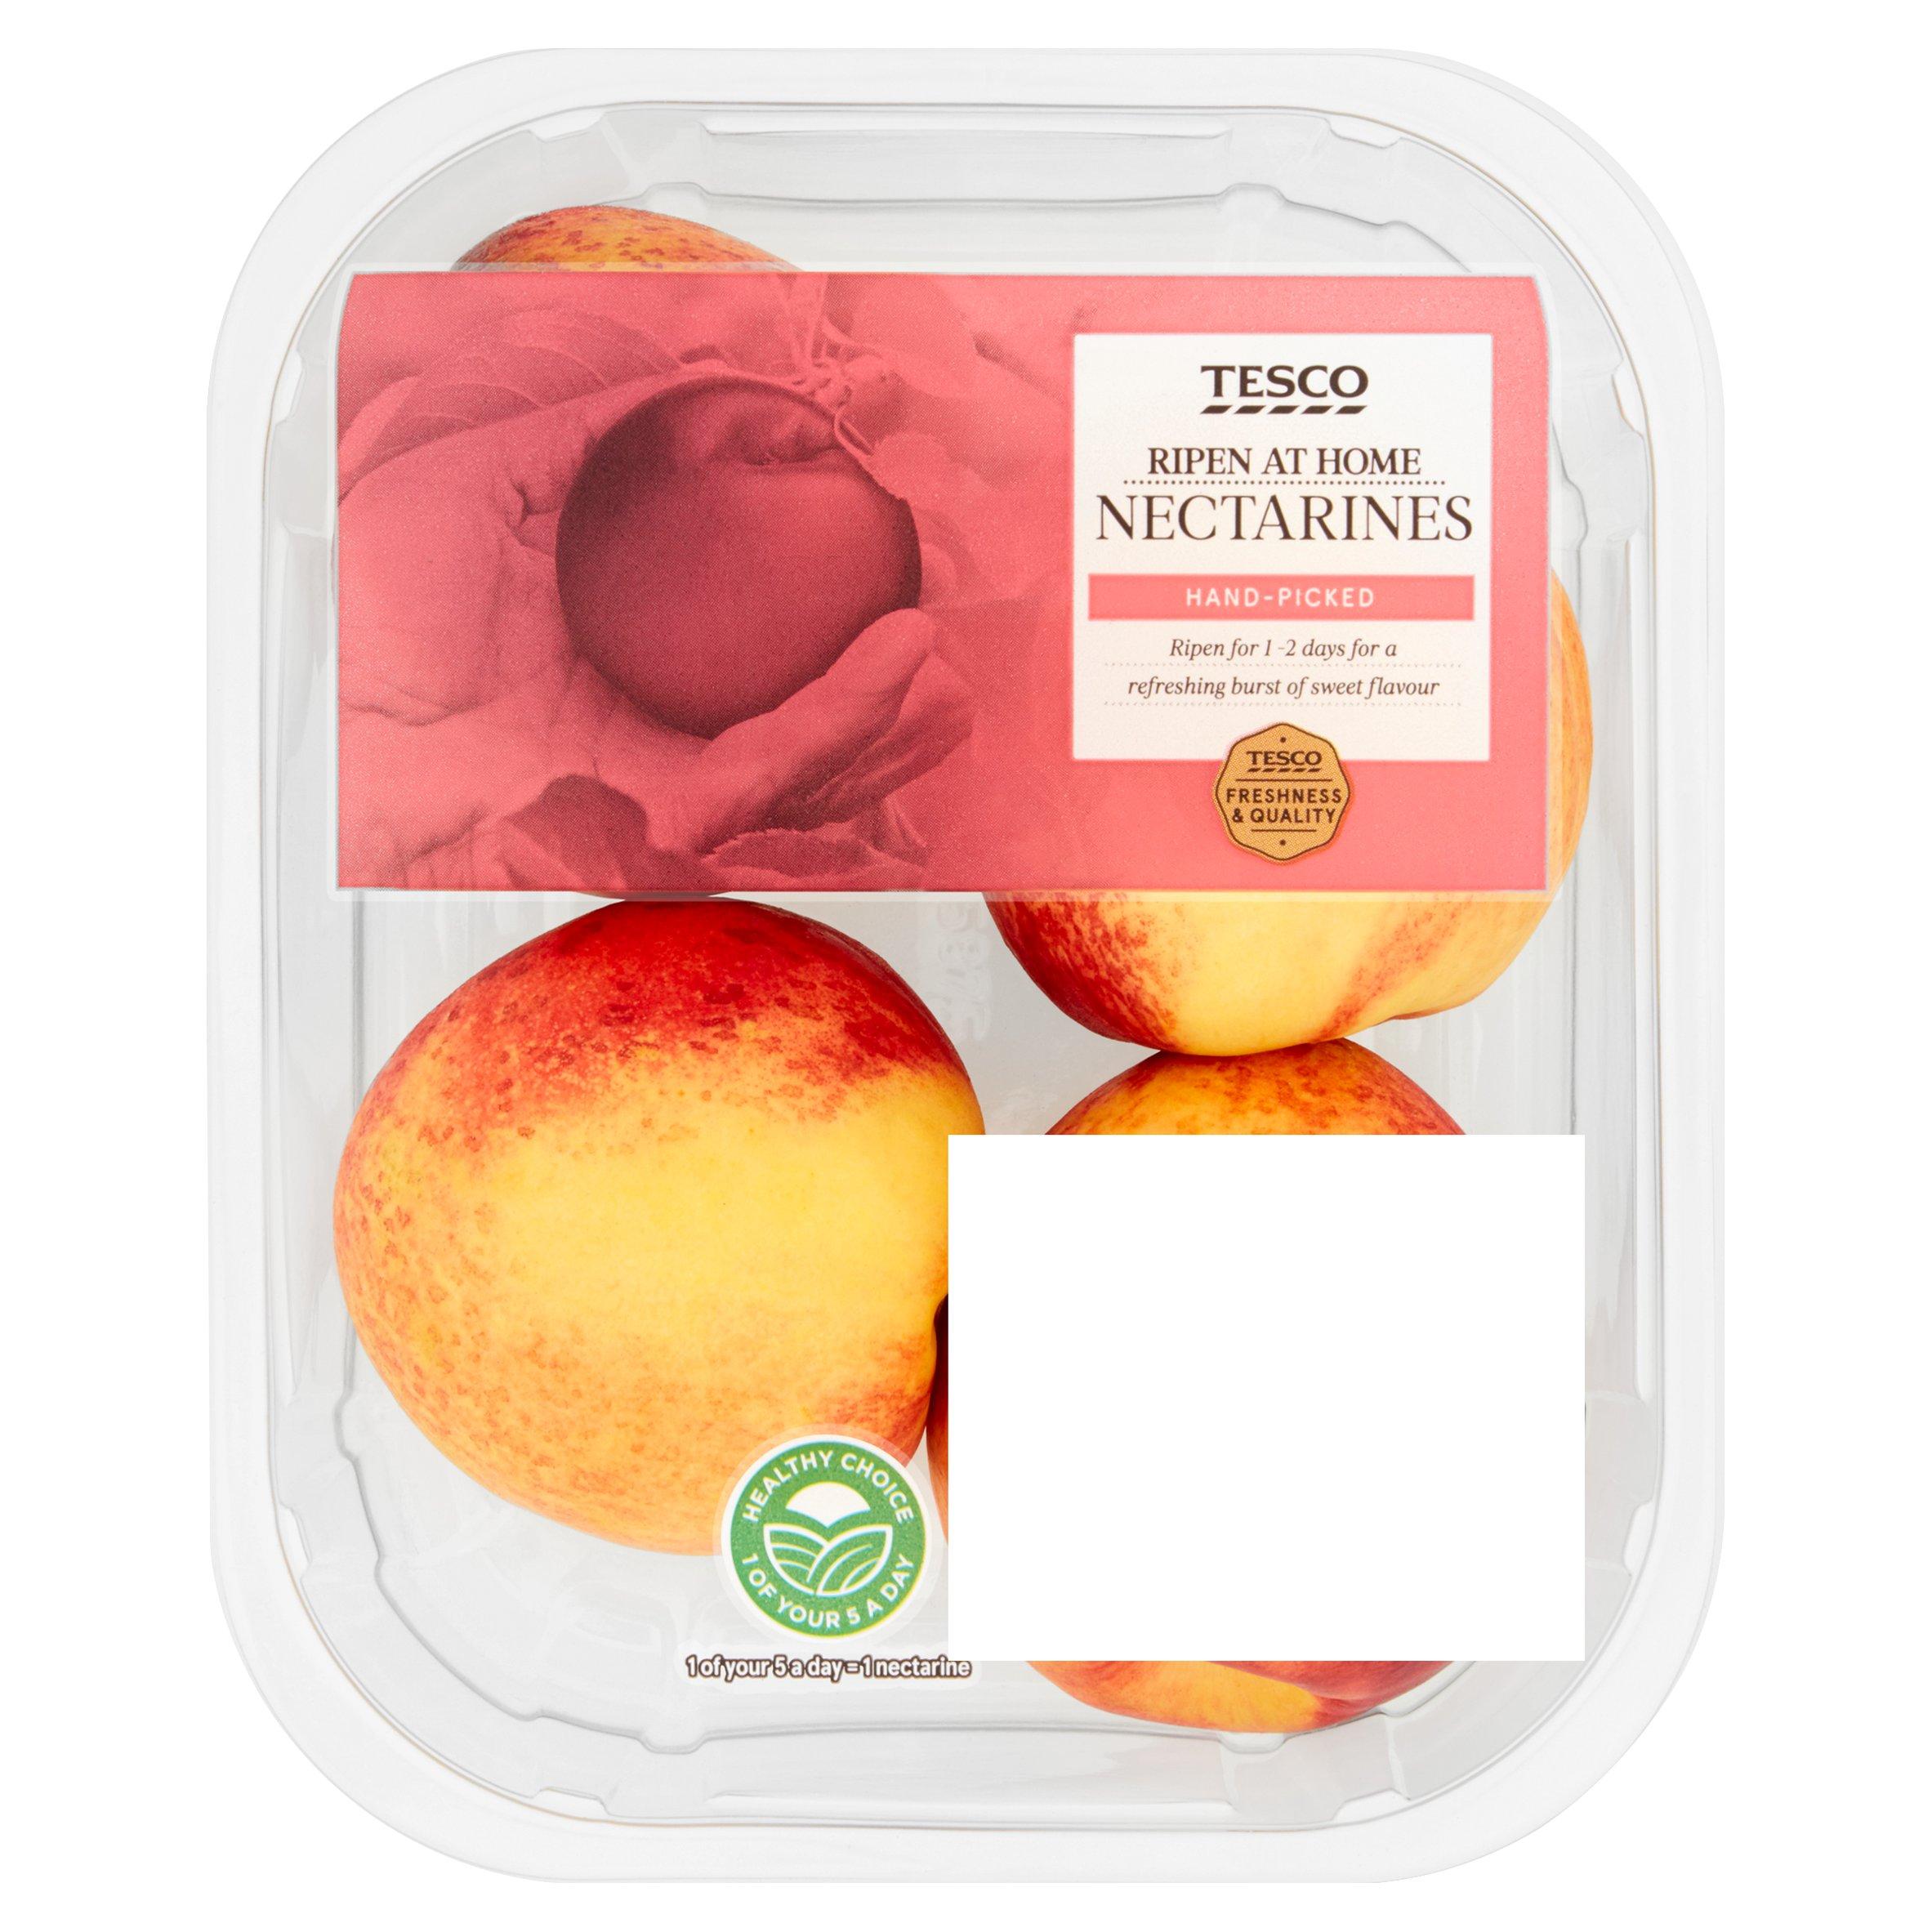 TESCO > Fresh Food > Tesco Nectarines Minimum 4 Pack